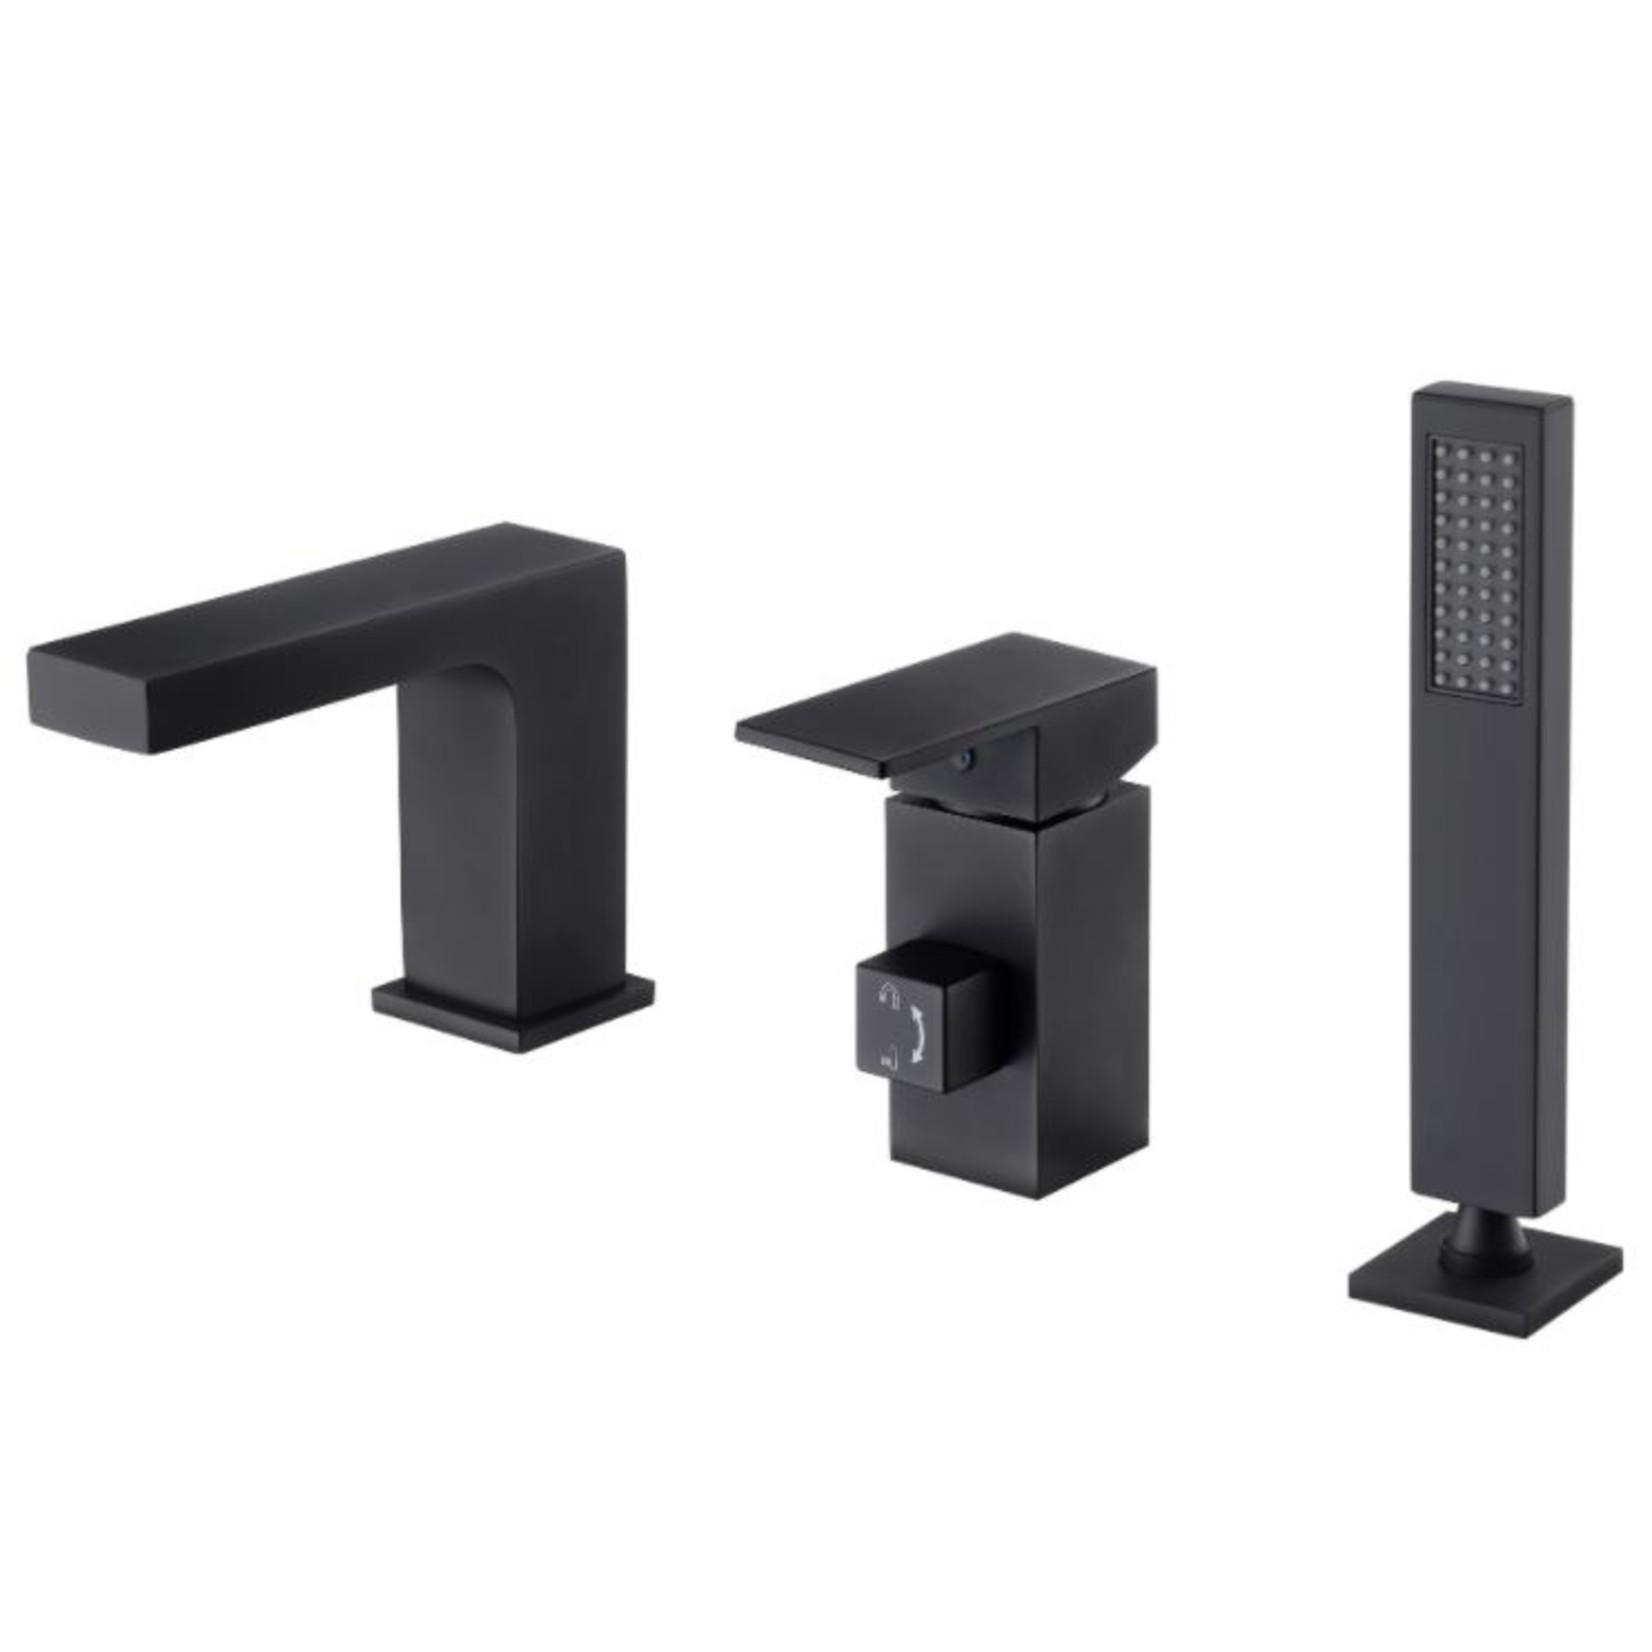 Robinet de bain romain noir MI-3821-03